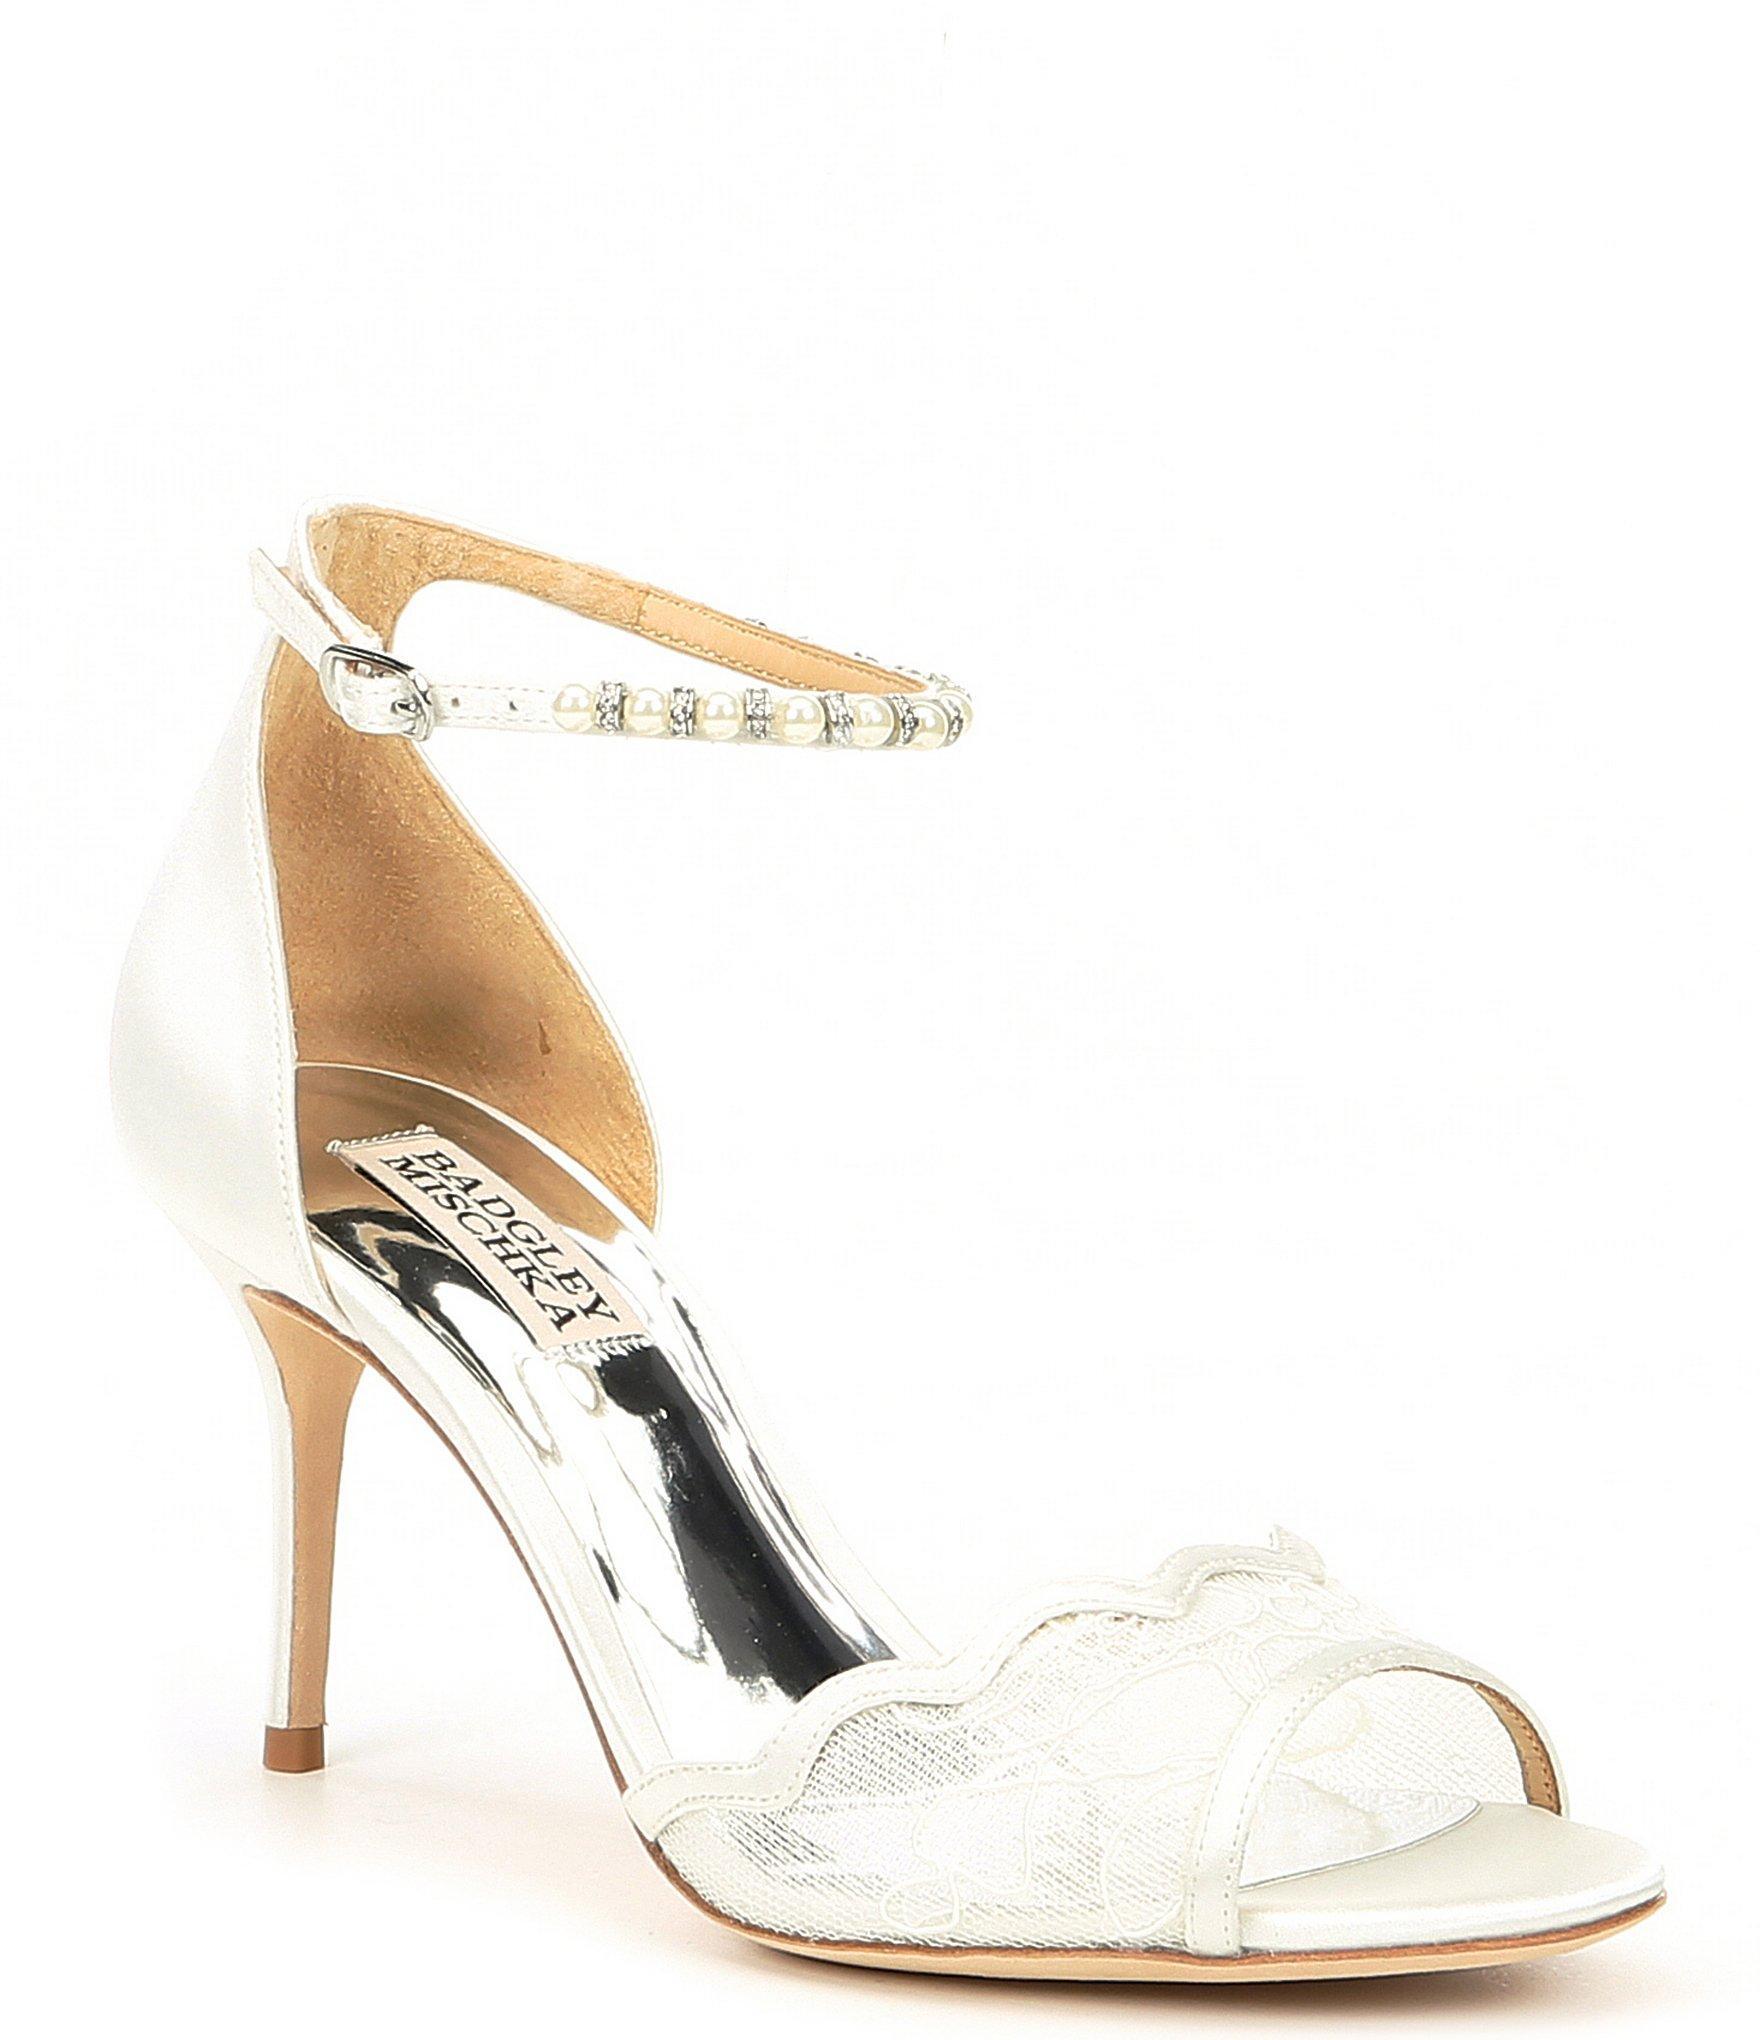 1f7dd45590 Badgley Mischka Lenora Dress Sandals in White - Lyst